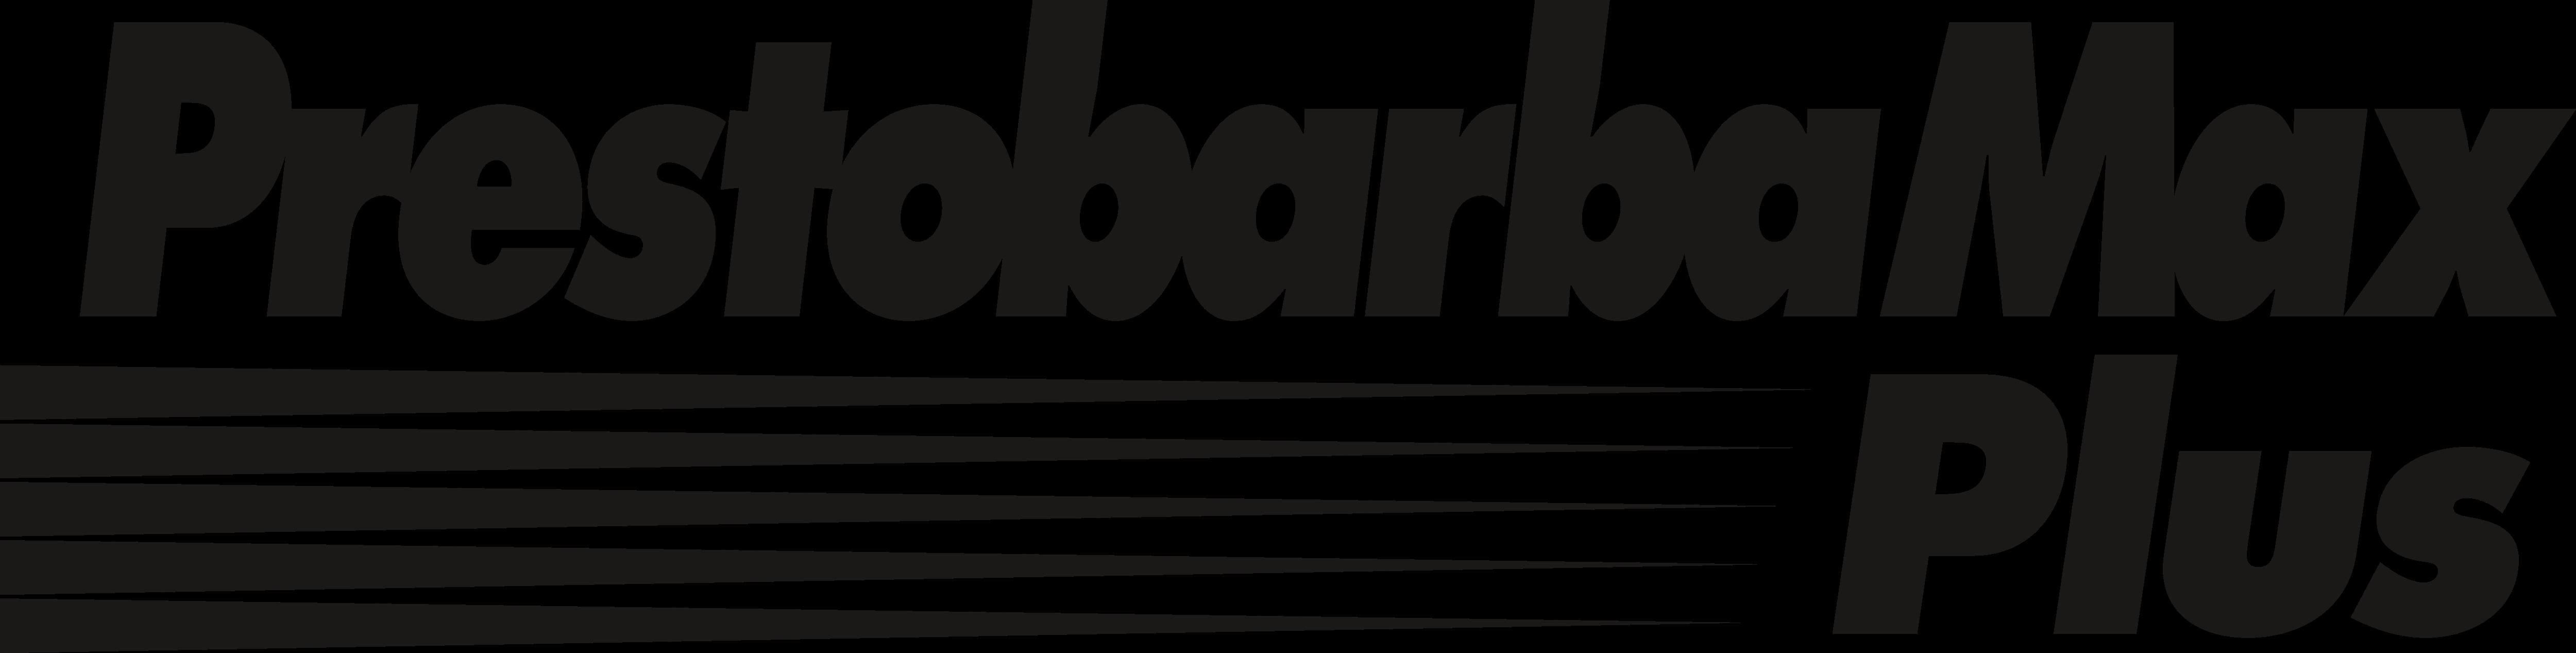 Gillette Prestobarbamax Plus Logos Download